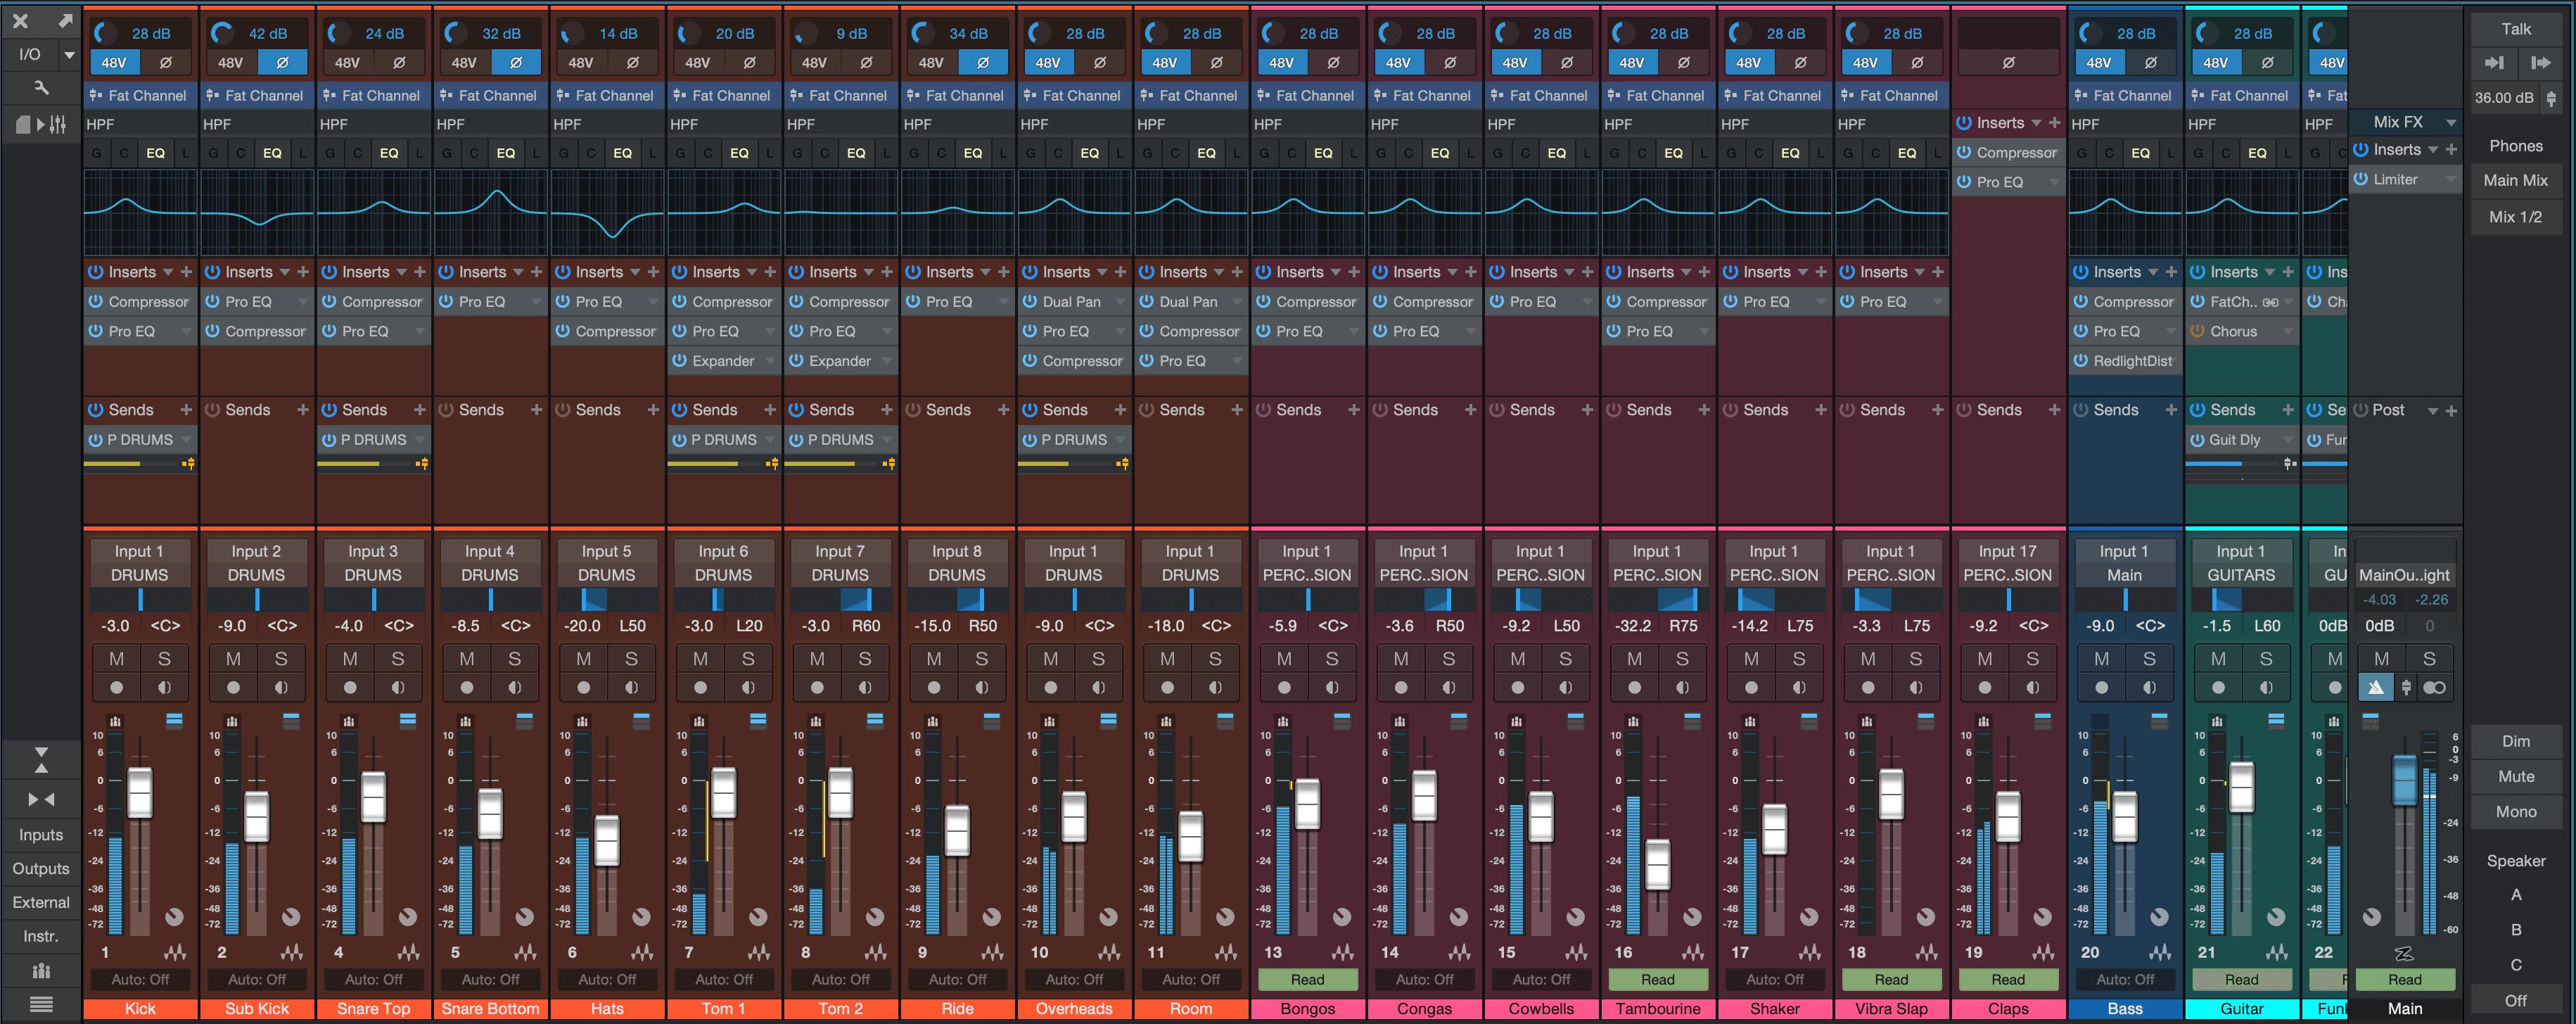 PreSonus Studio One 4 5 Adds 70+ Features and Enhancements | Press